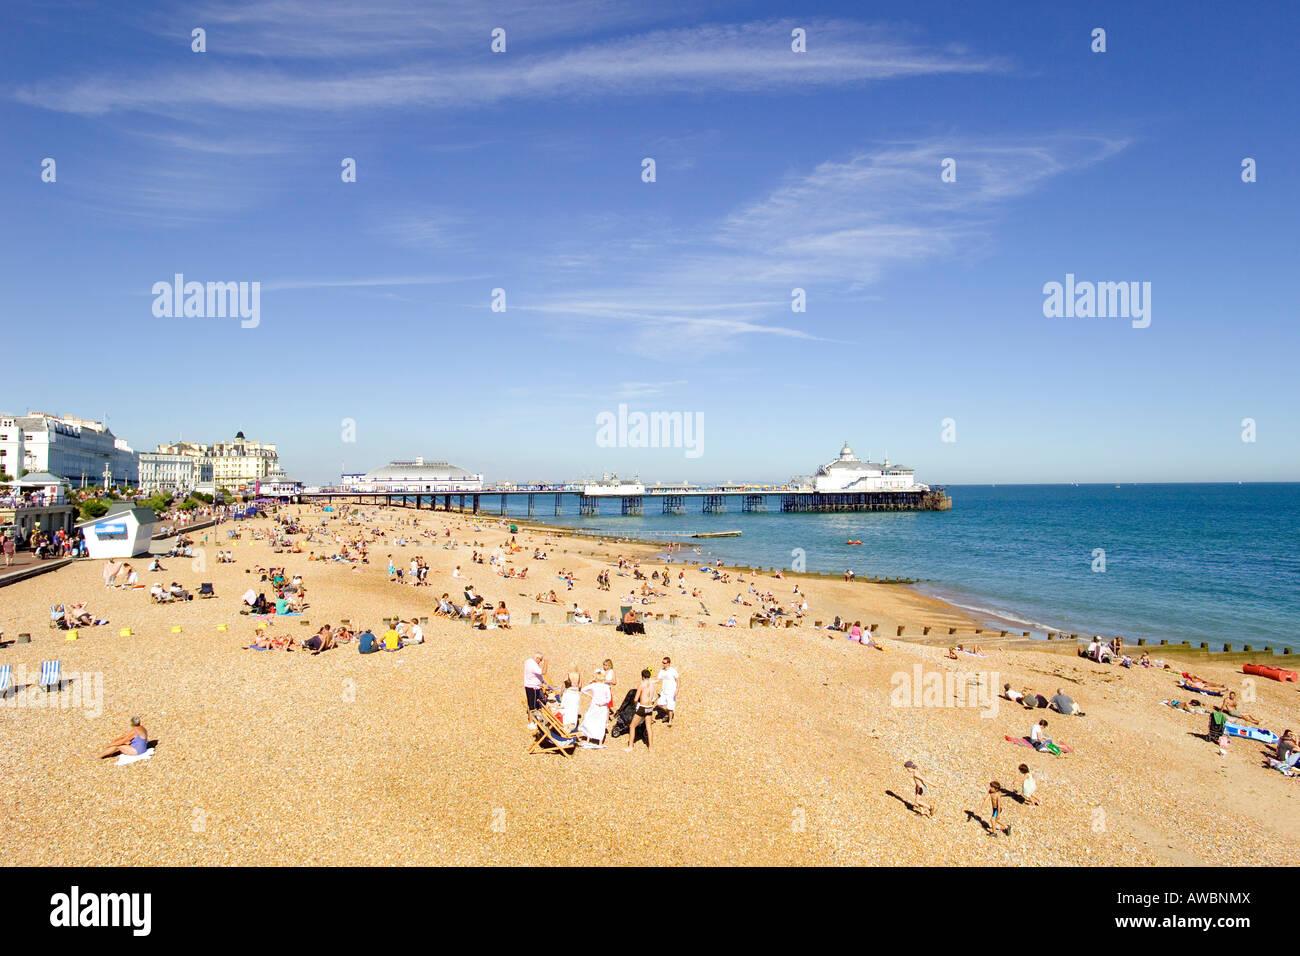 Typical British Summer Holiday Scene Stock Photos